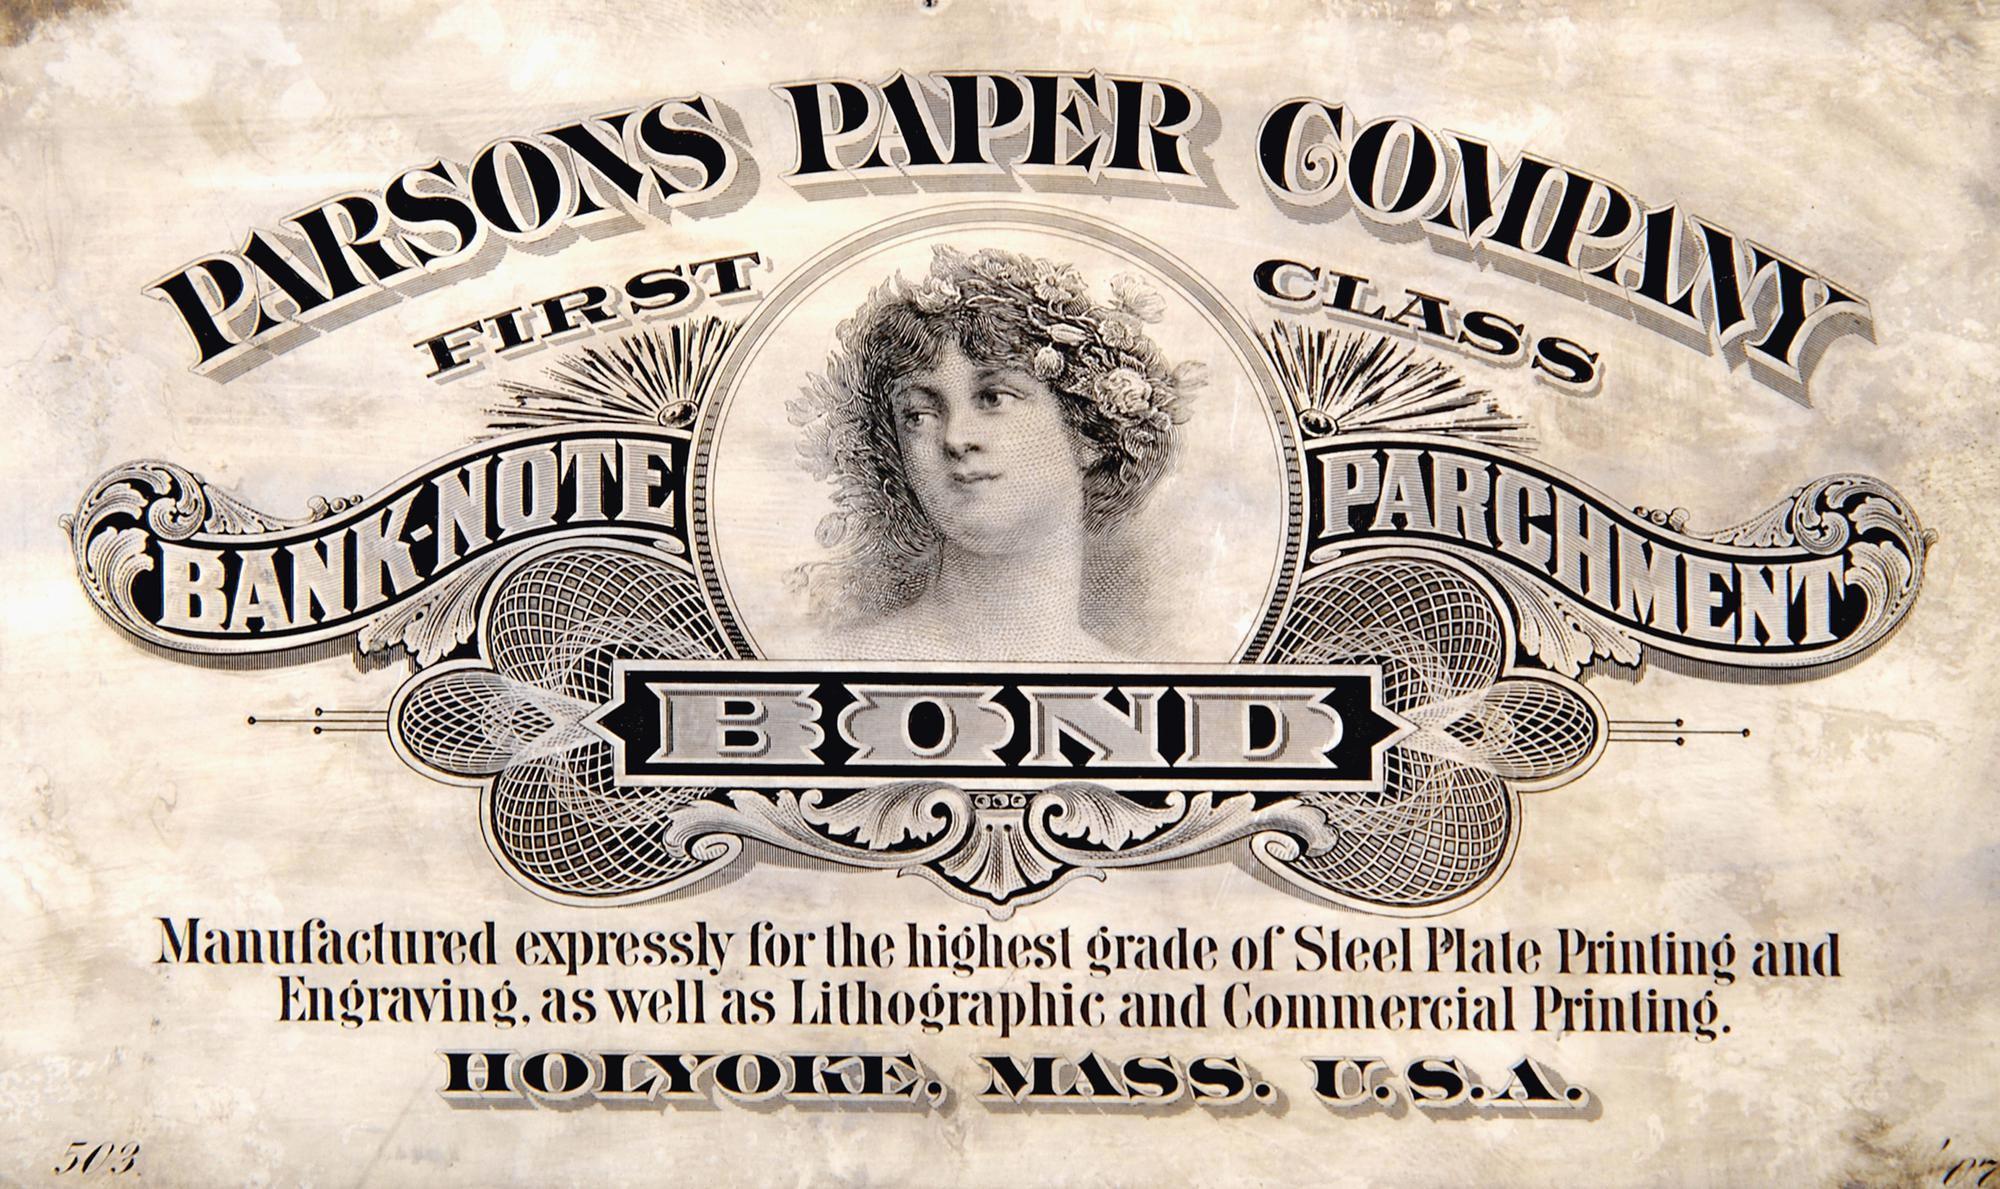 Parsons Paper Company_F1_Steel.jpg